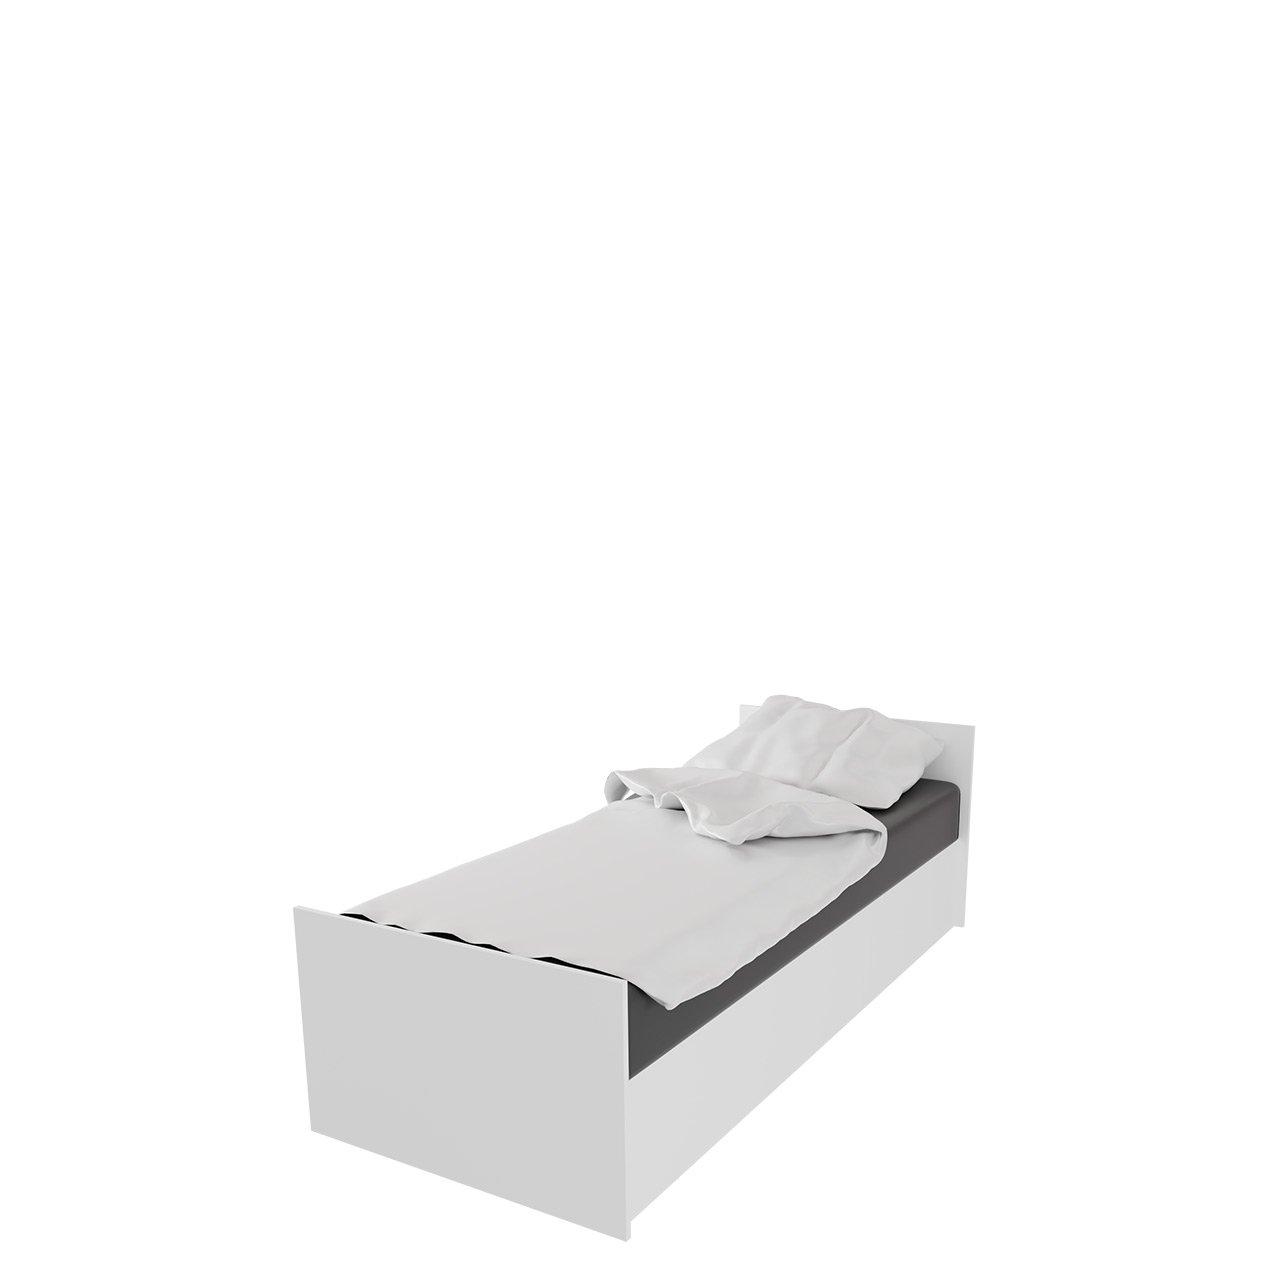 Penelopa P8 80 ágy